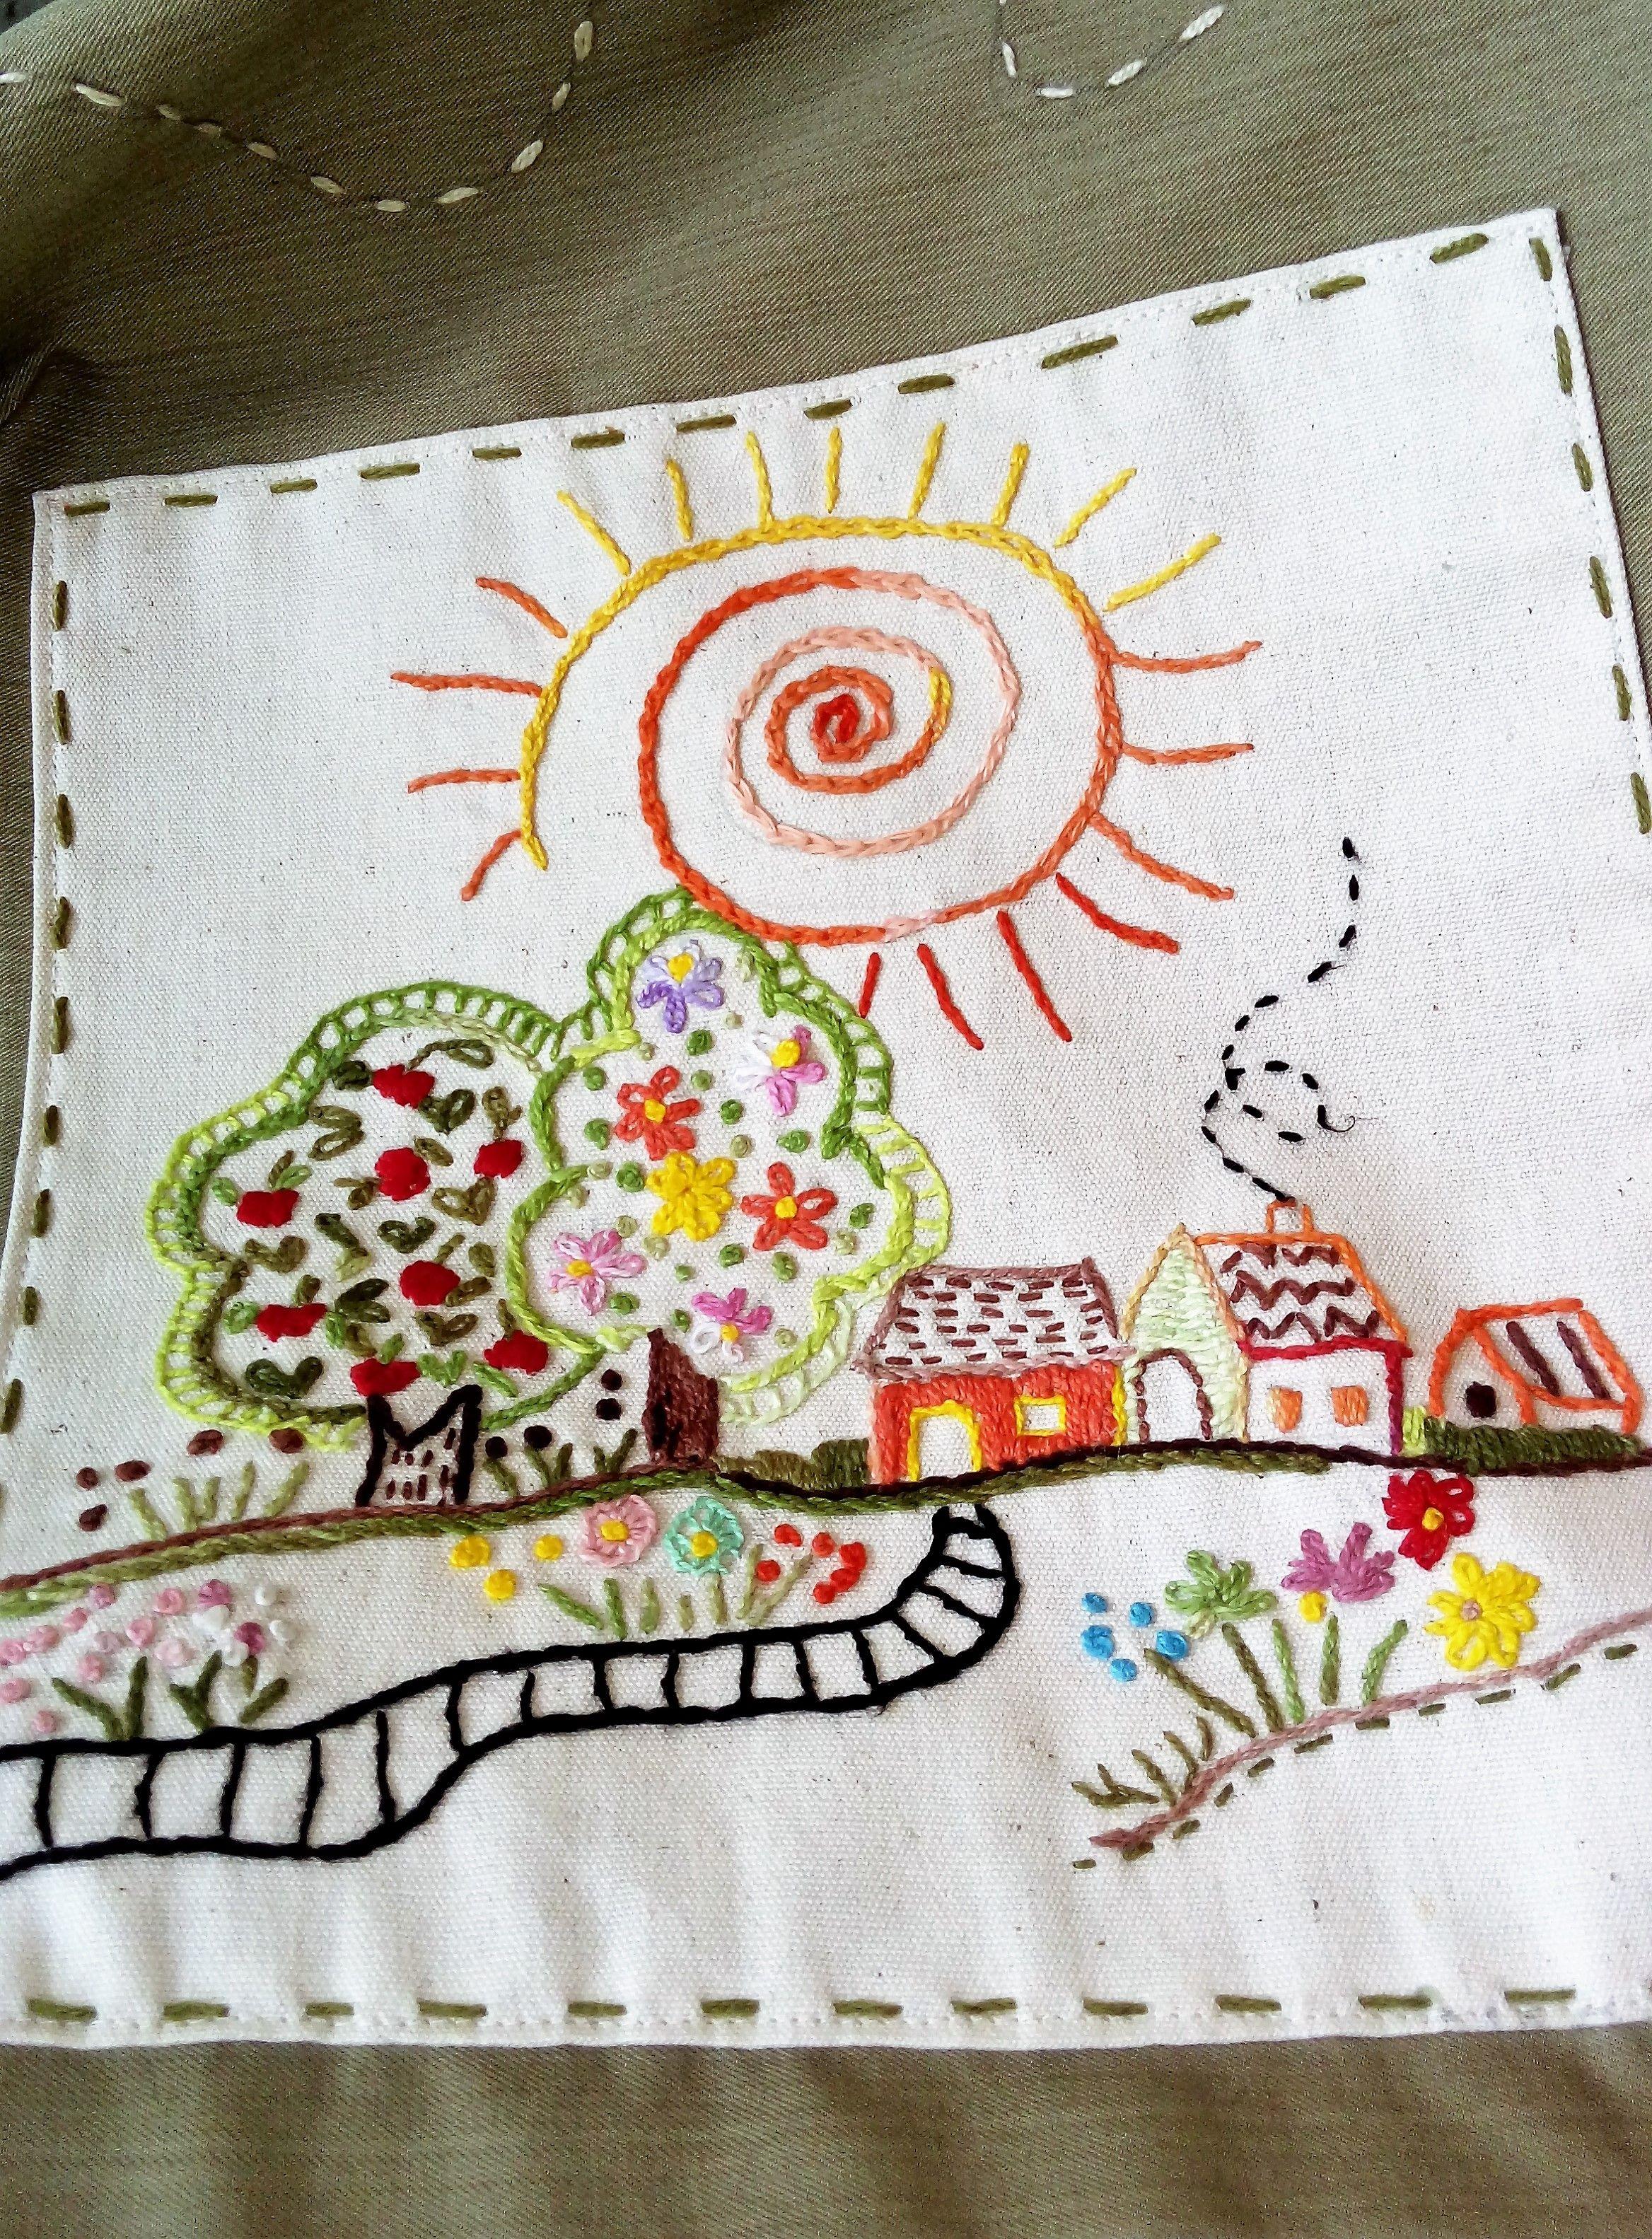 Pin by pinar coşkun on bebek kıyafetleri pinterest embroidery